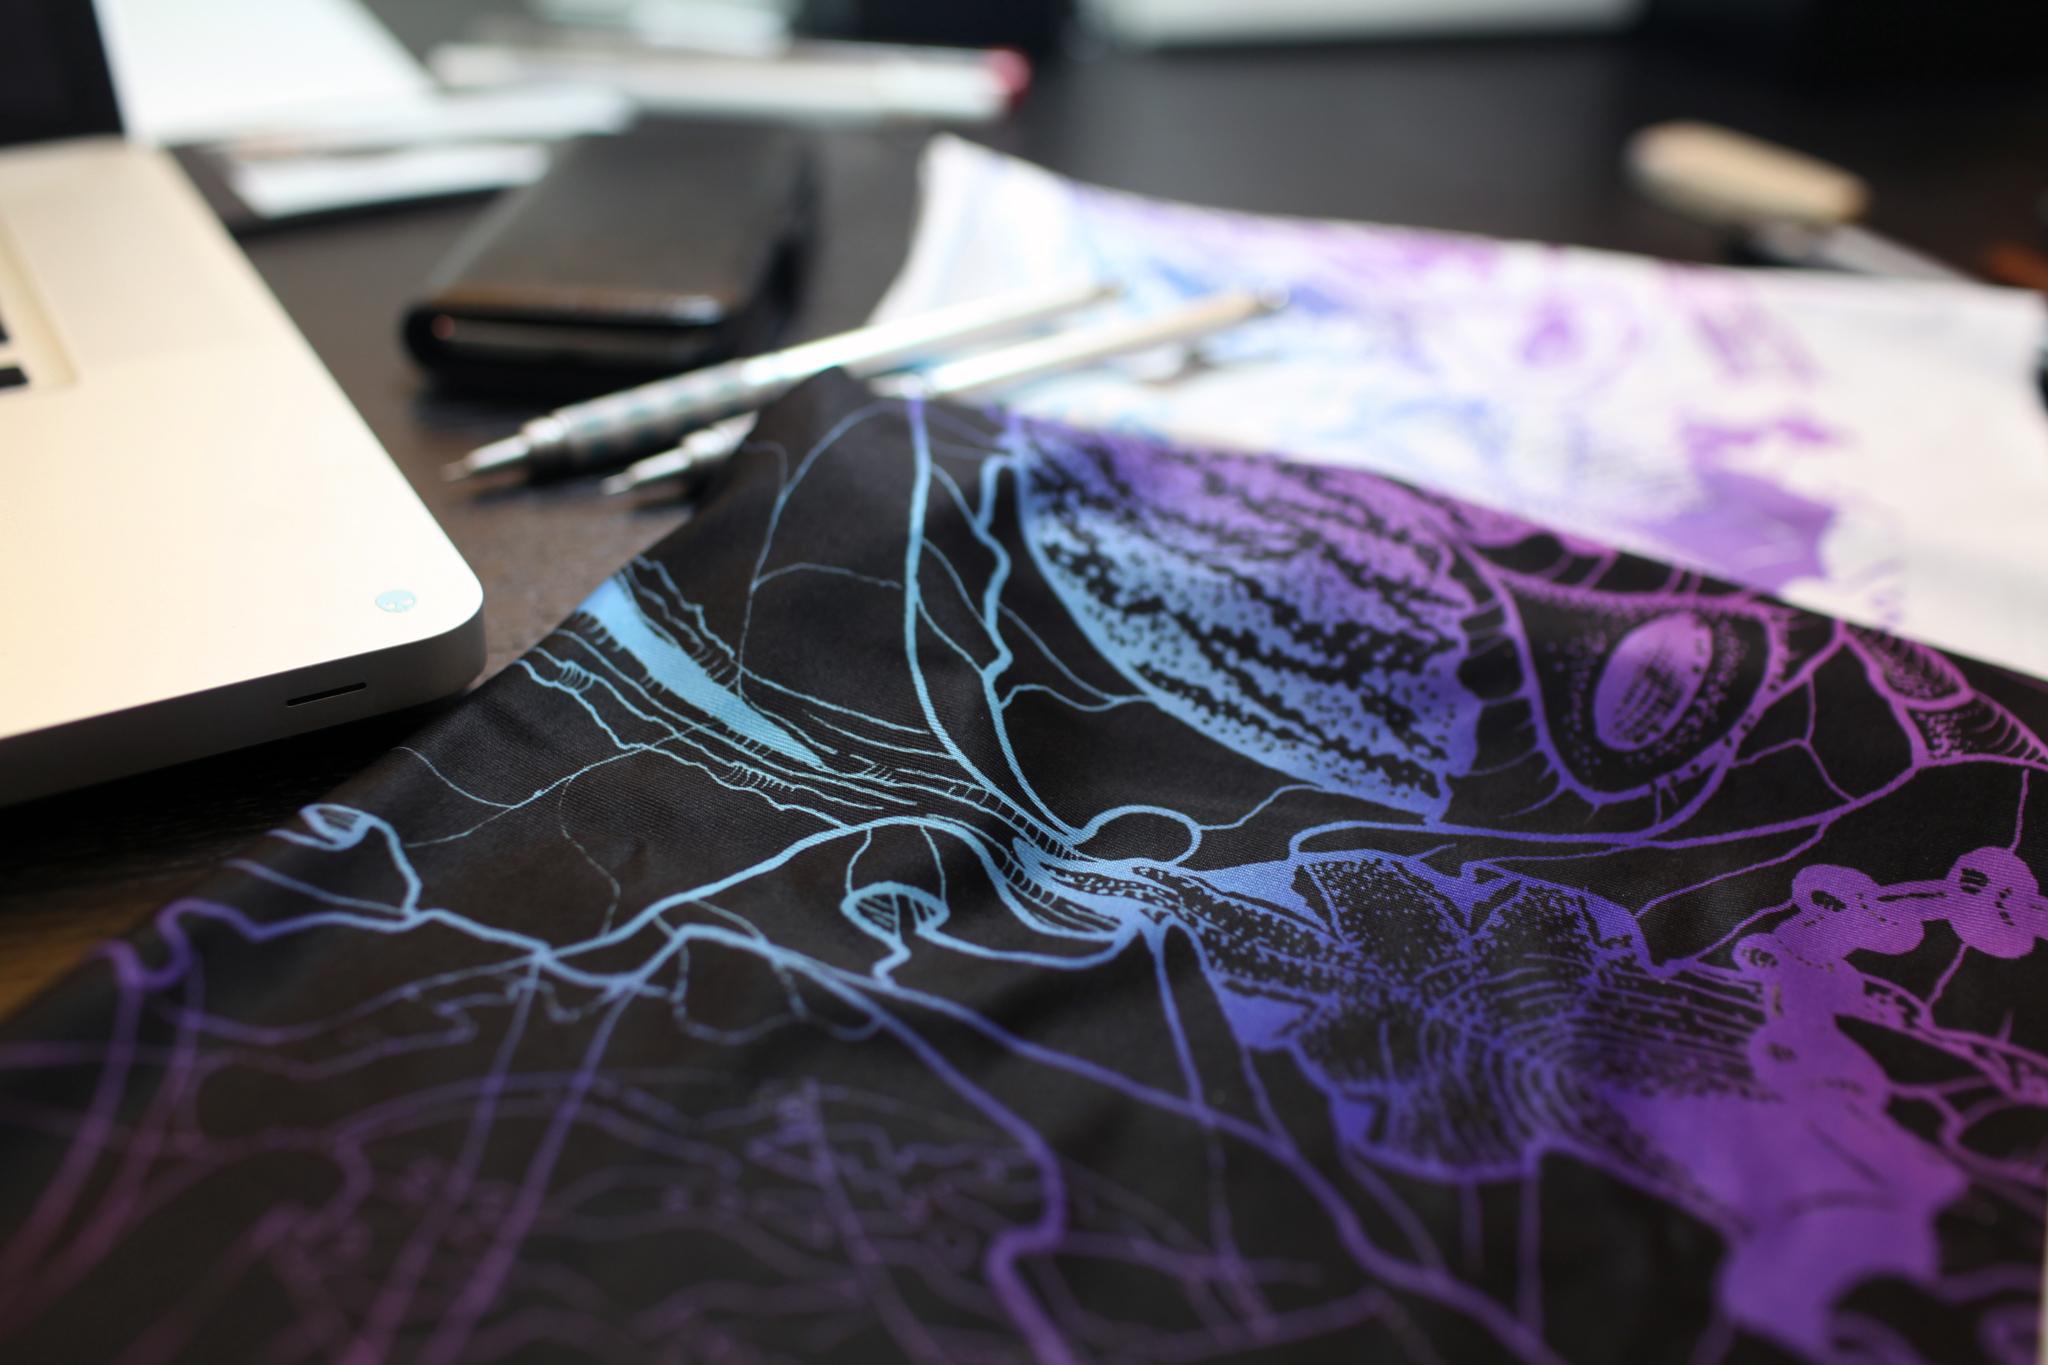 Alien Botany fabric, Zoetica Ebb